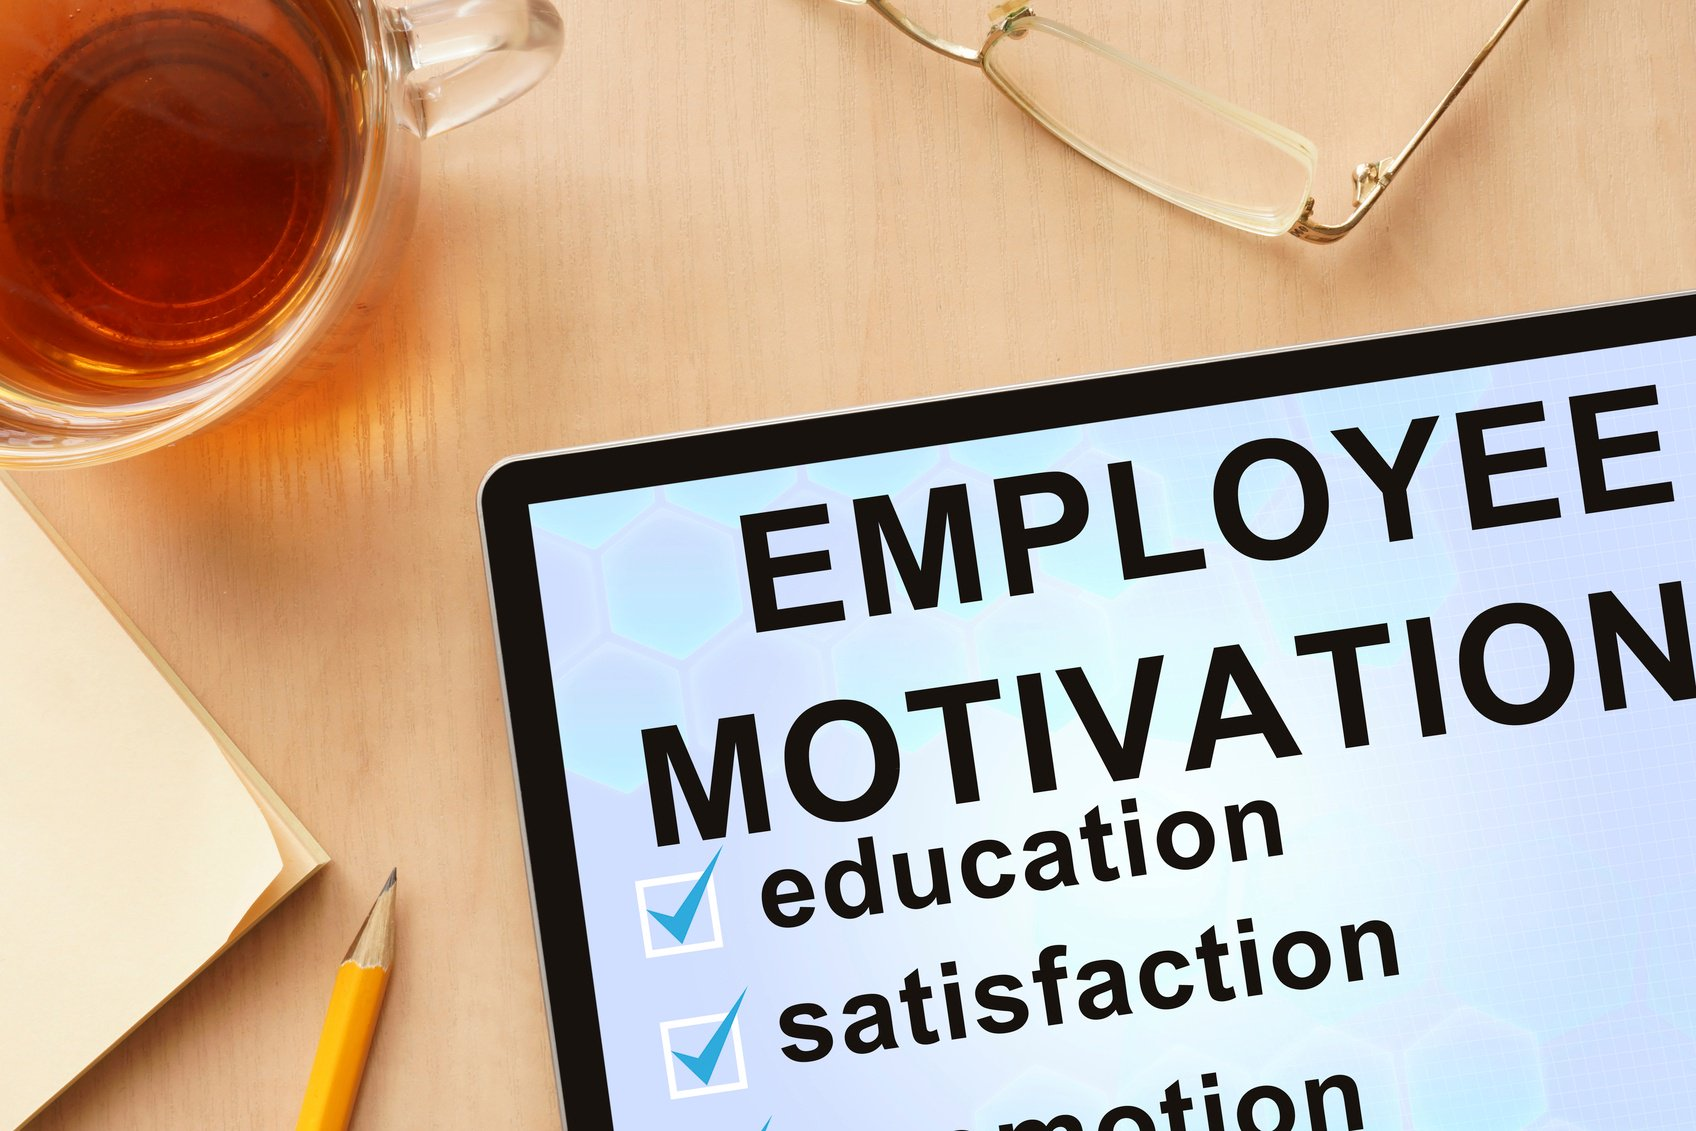 Employee motivaiton